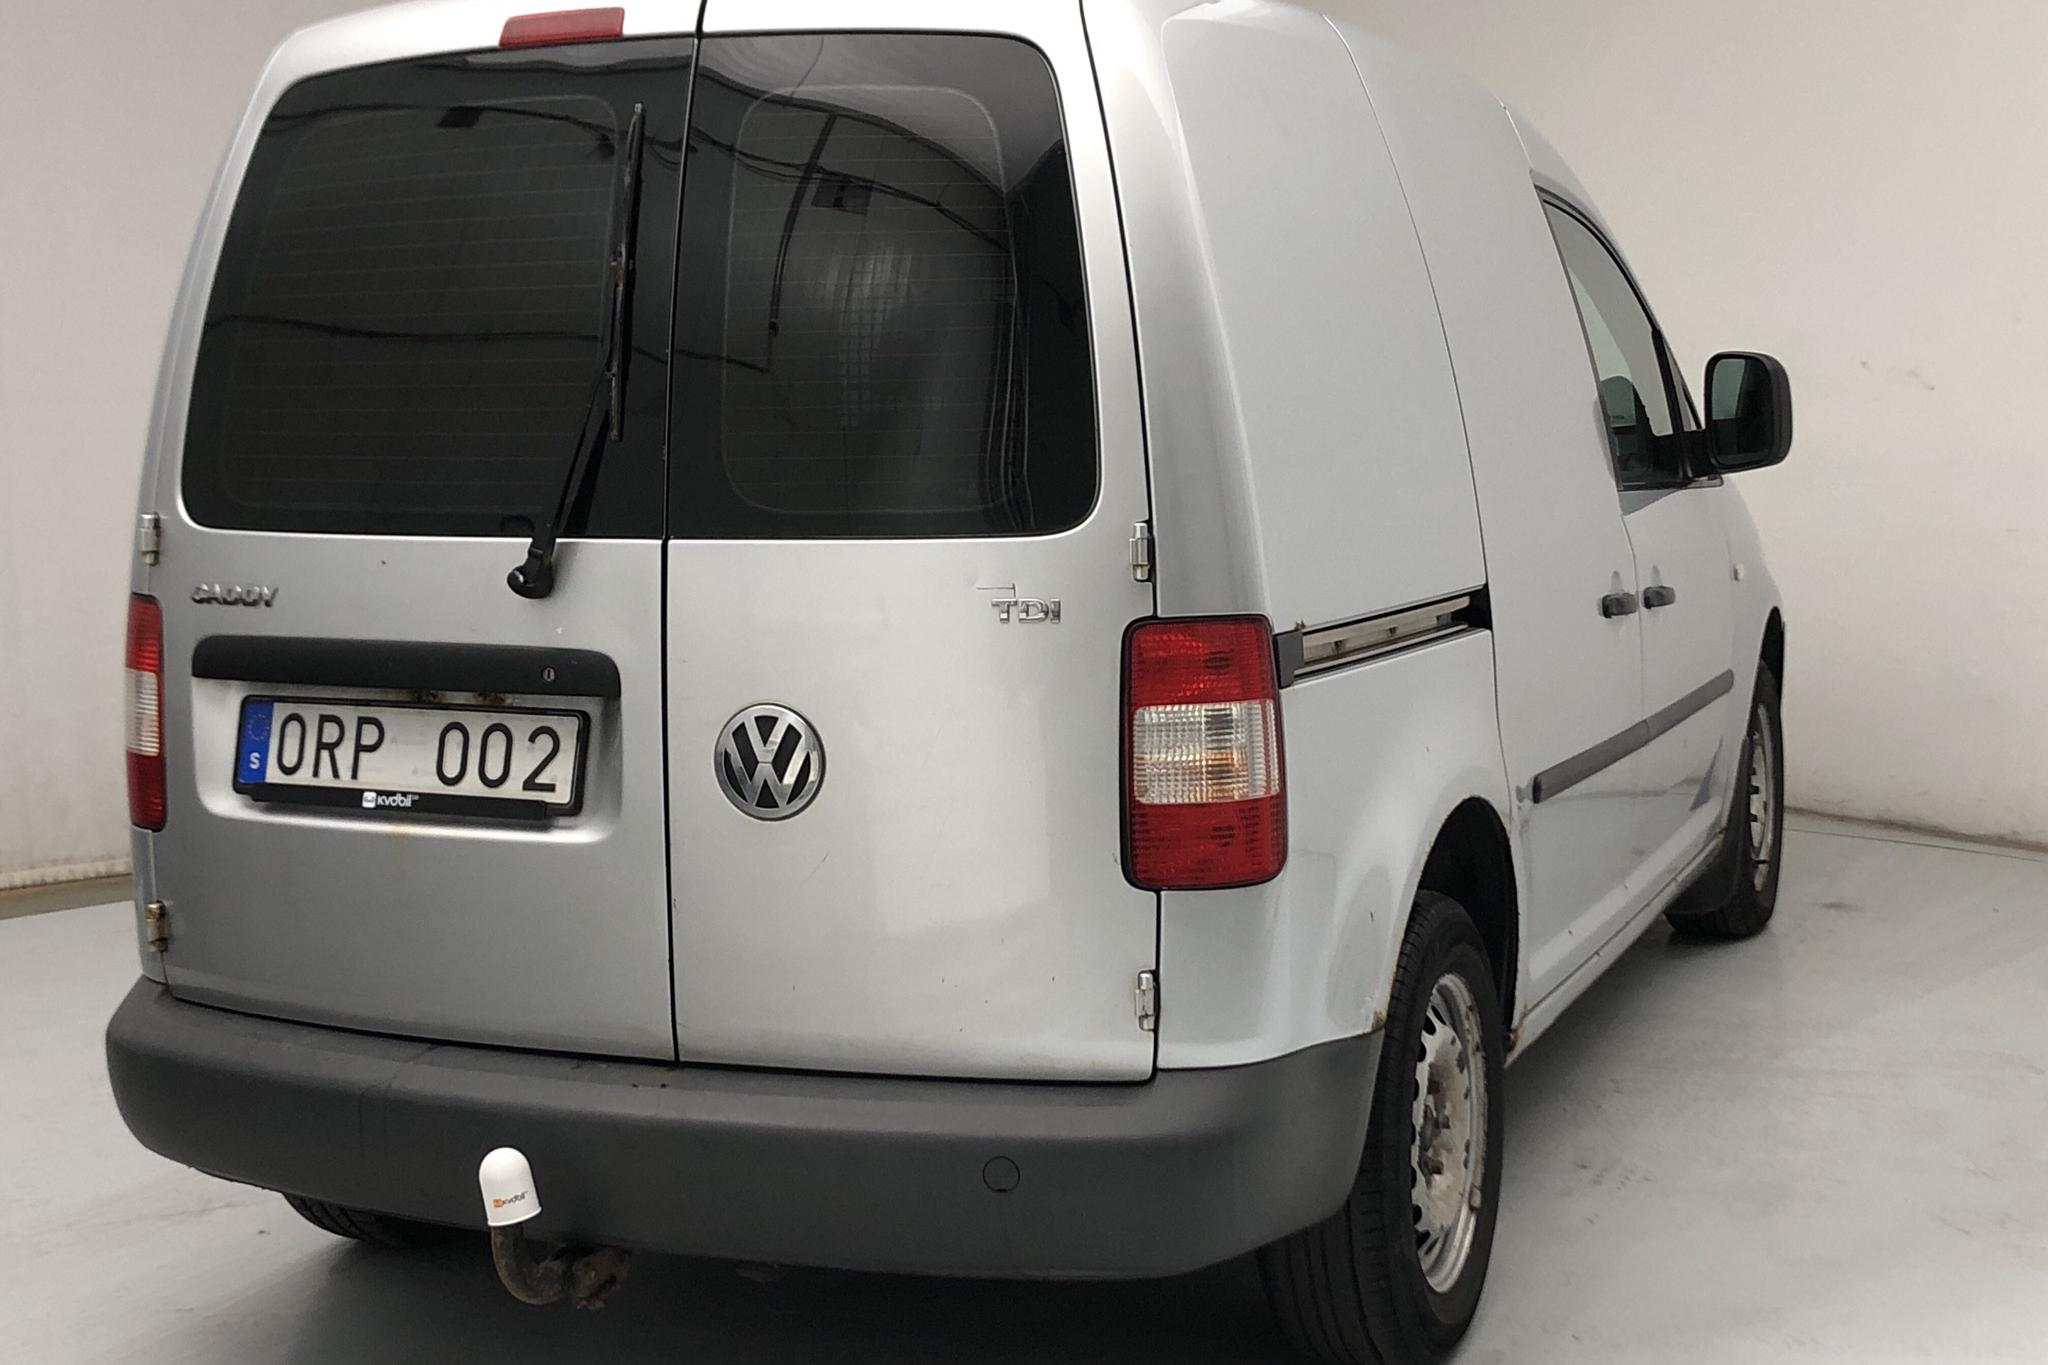 VW Caddy 1.9 TDI Skåp (105hk) - 121 620 km - Manual - silver - 2008